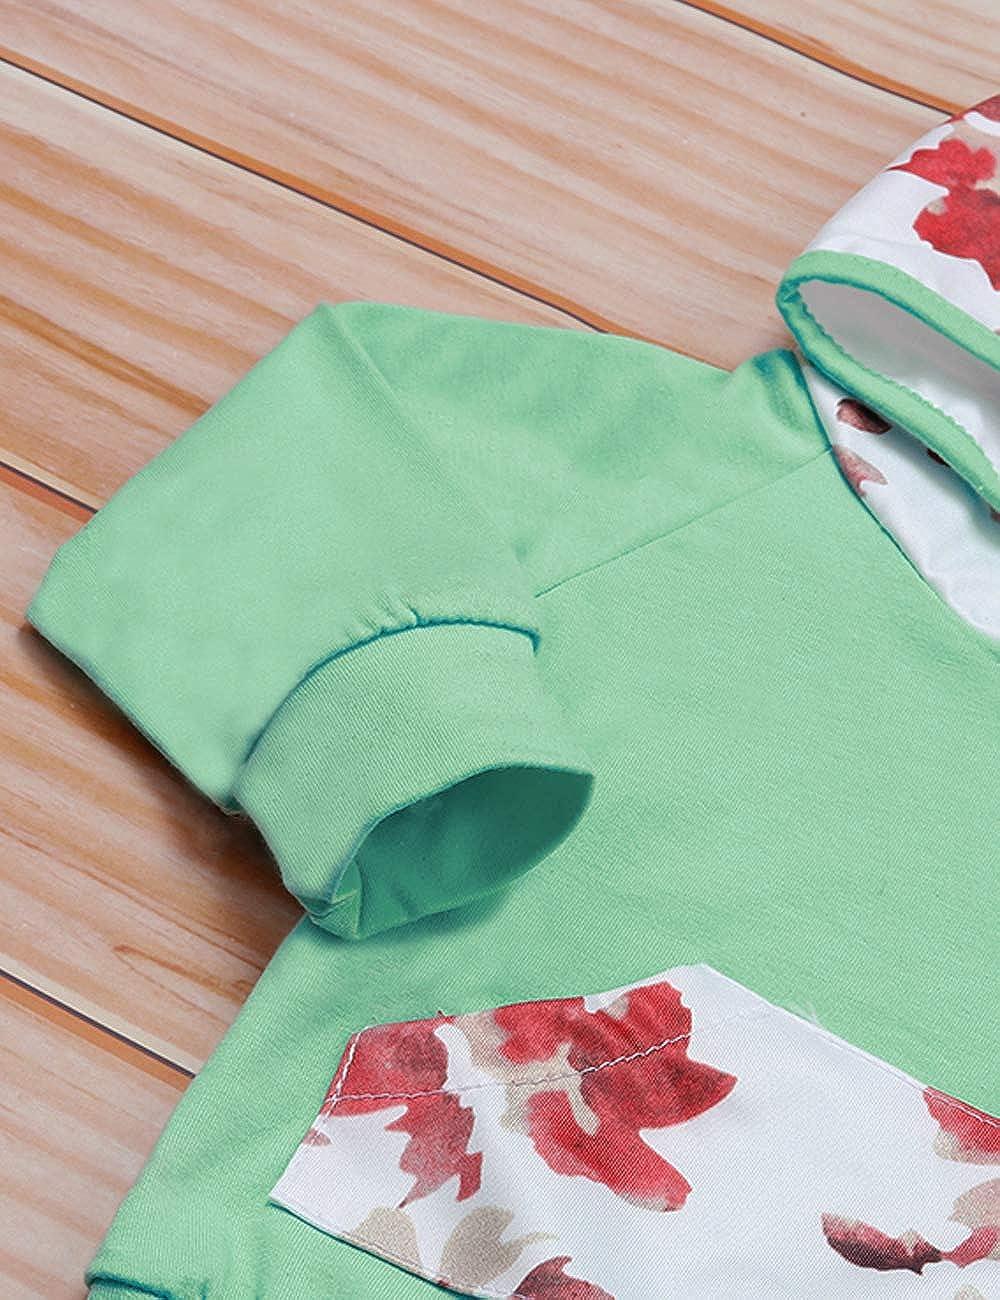 Newborn Baby Girl Outfits Set Elf Deer Print Long Sleeve Hoodies Sweatshirt Pants Headband Clothes Set